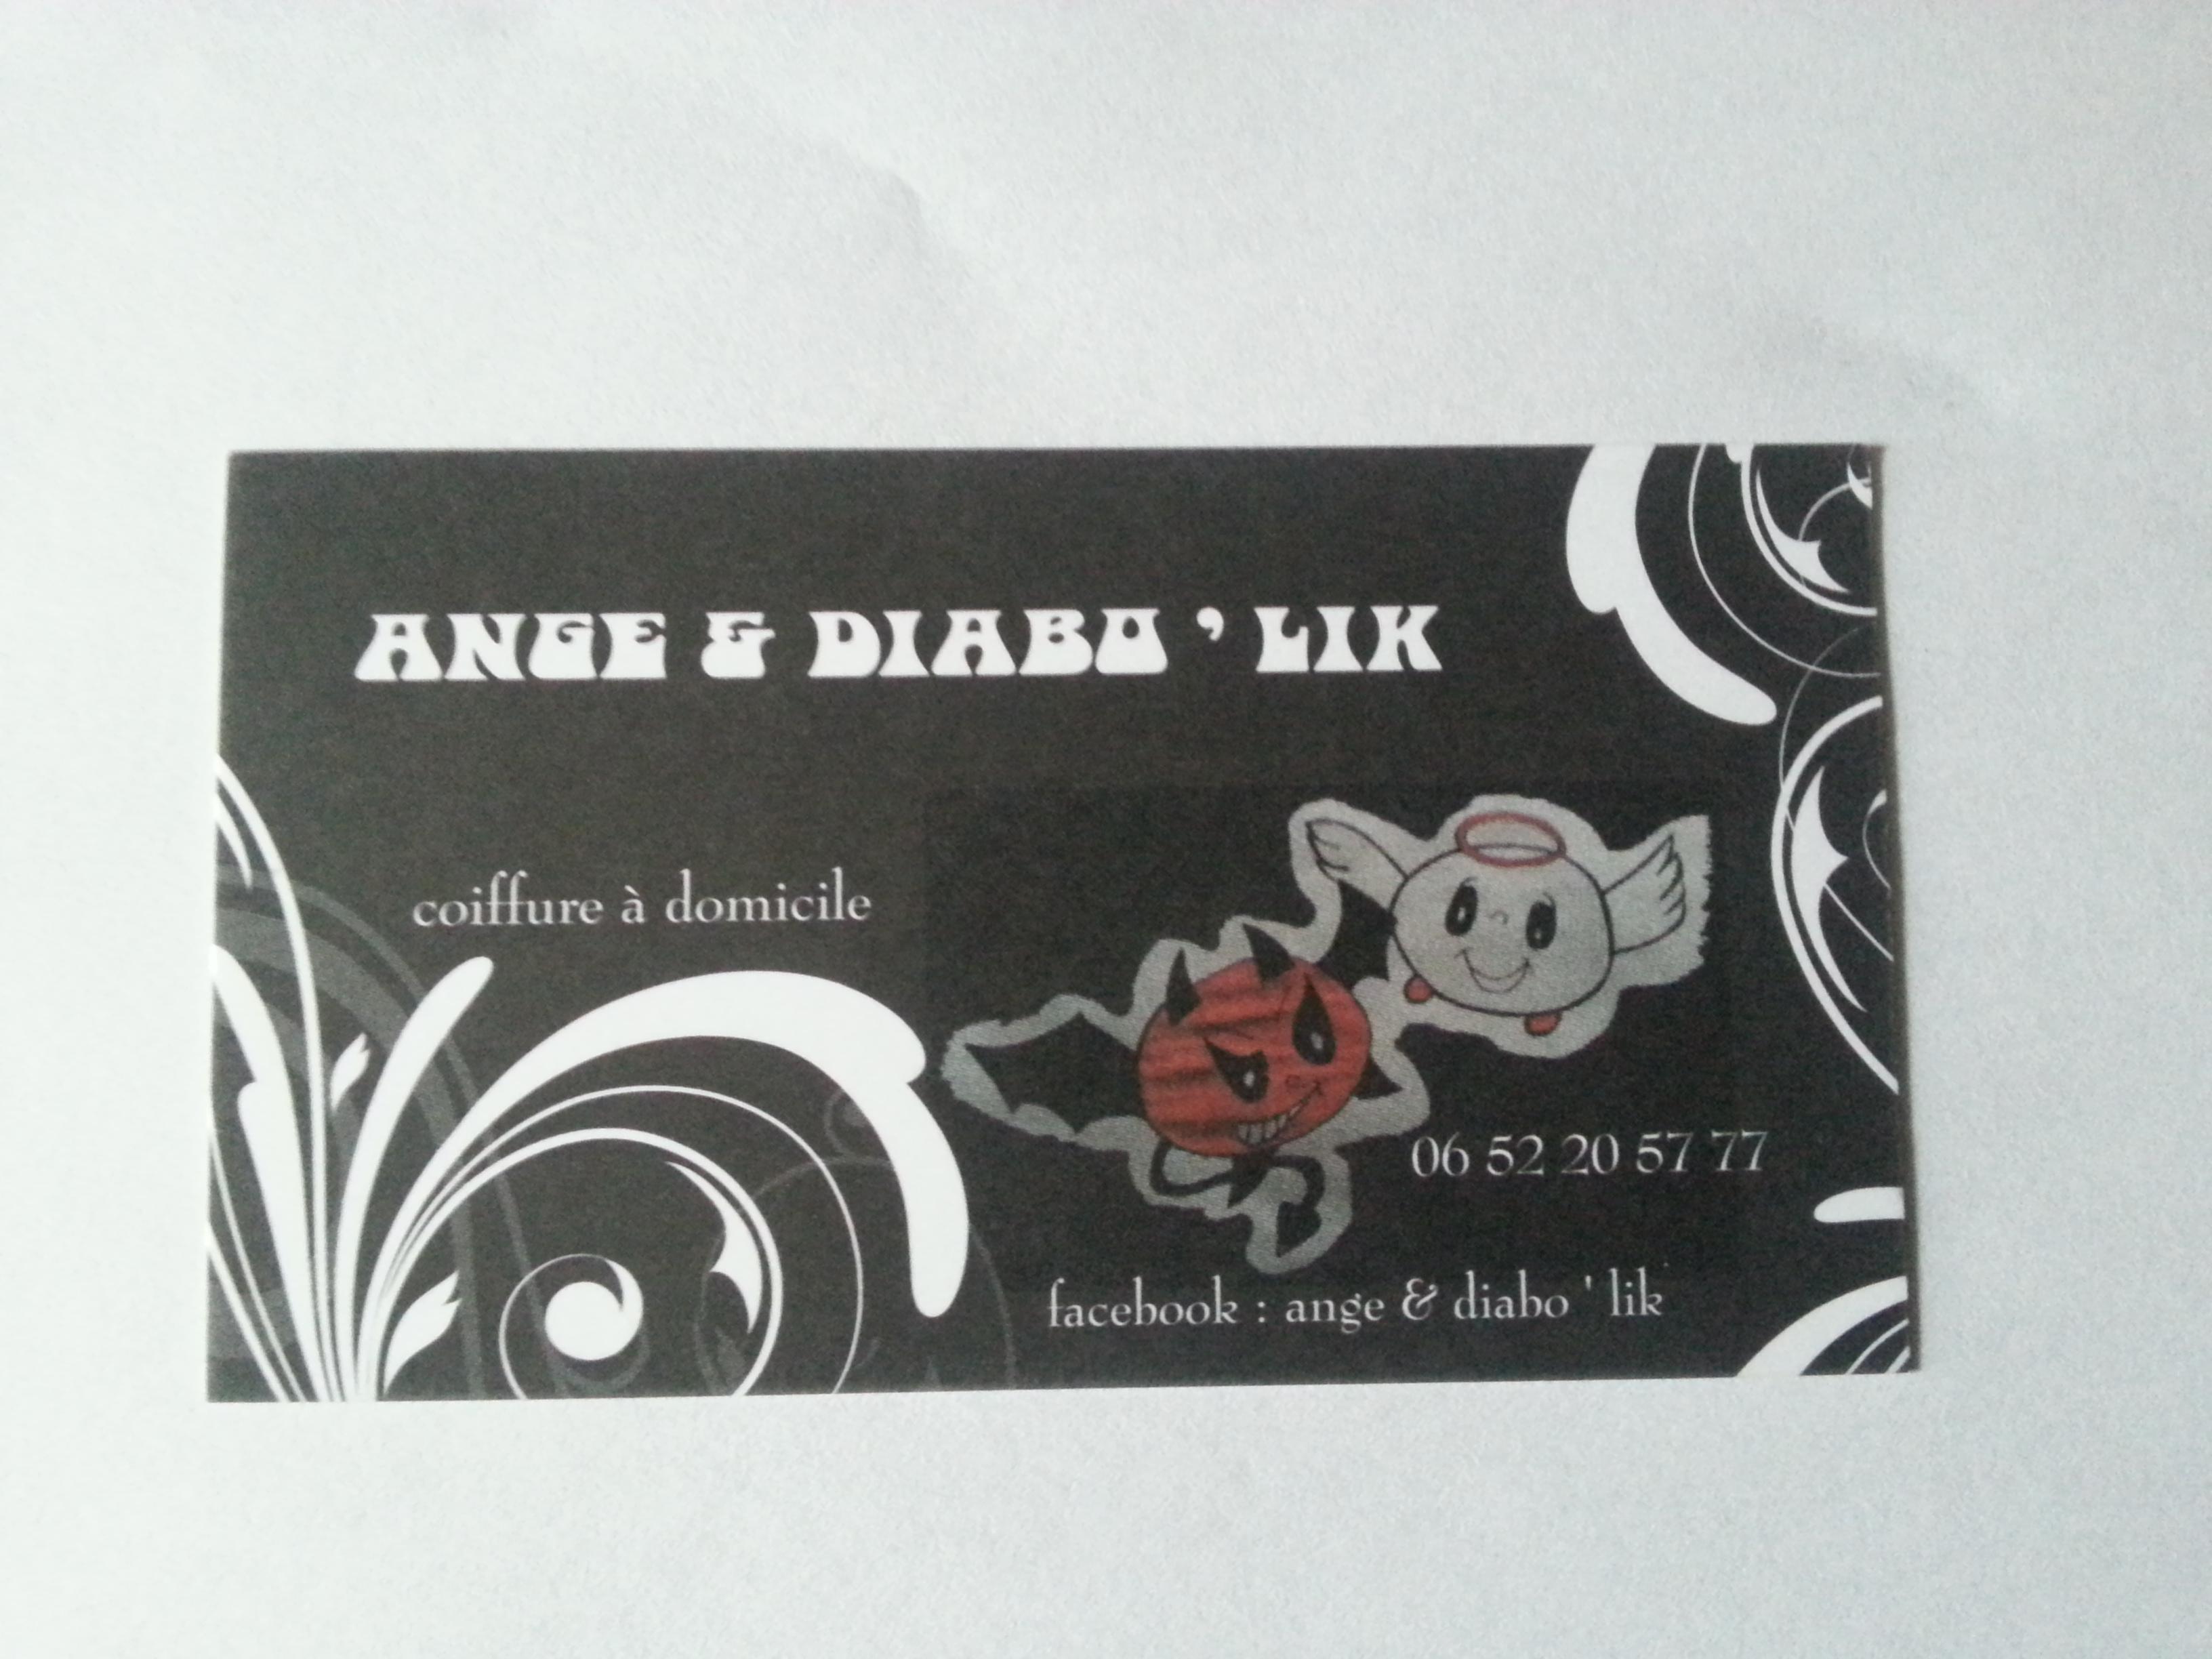 Ange & diabo'lik Moyeuvre-Grande